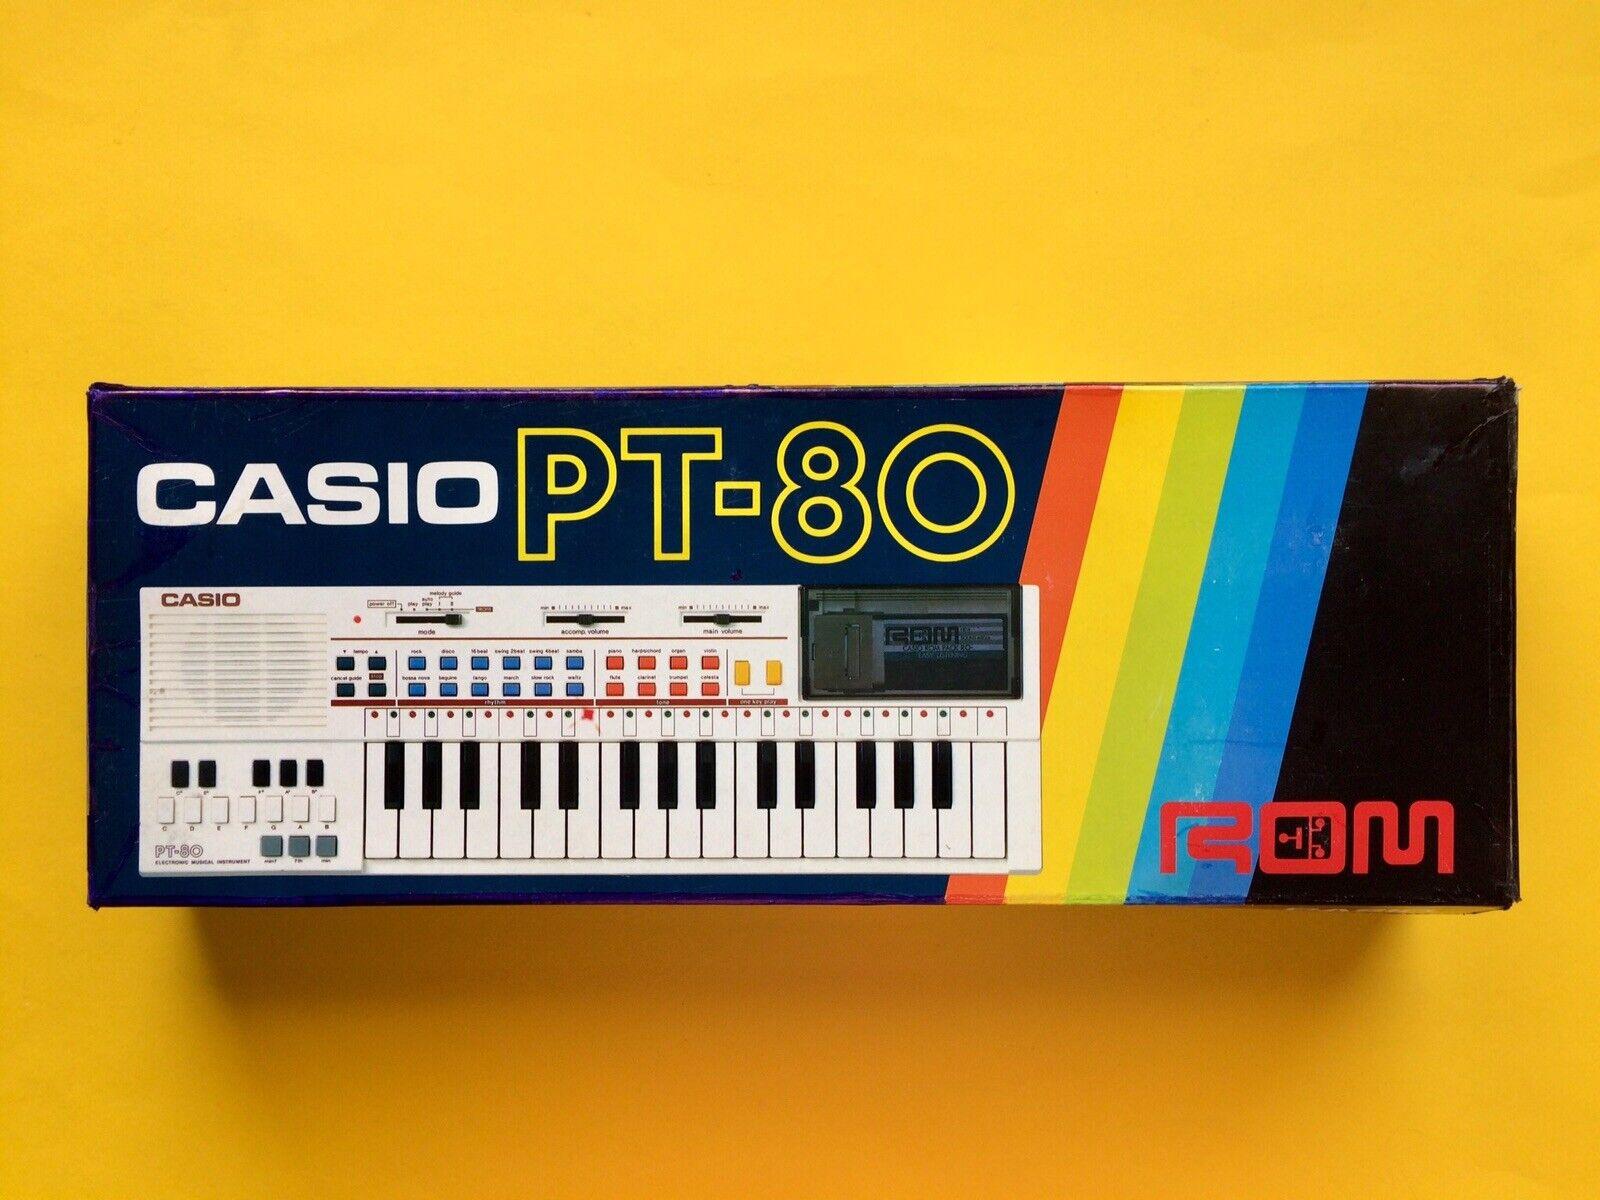 CASIO PT 80 ROM Electronic SyntheGrößer E Piano OVP Box KEYBOARD Retro Computer 1